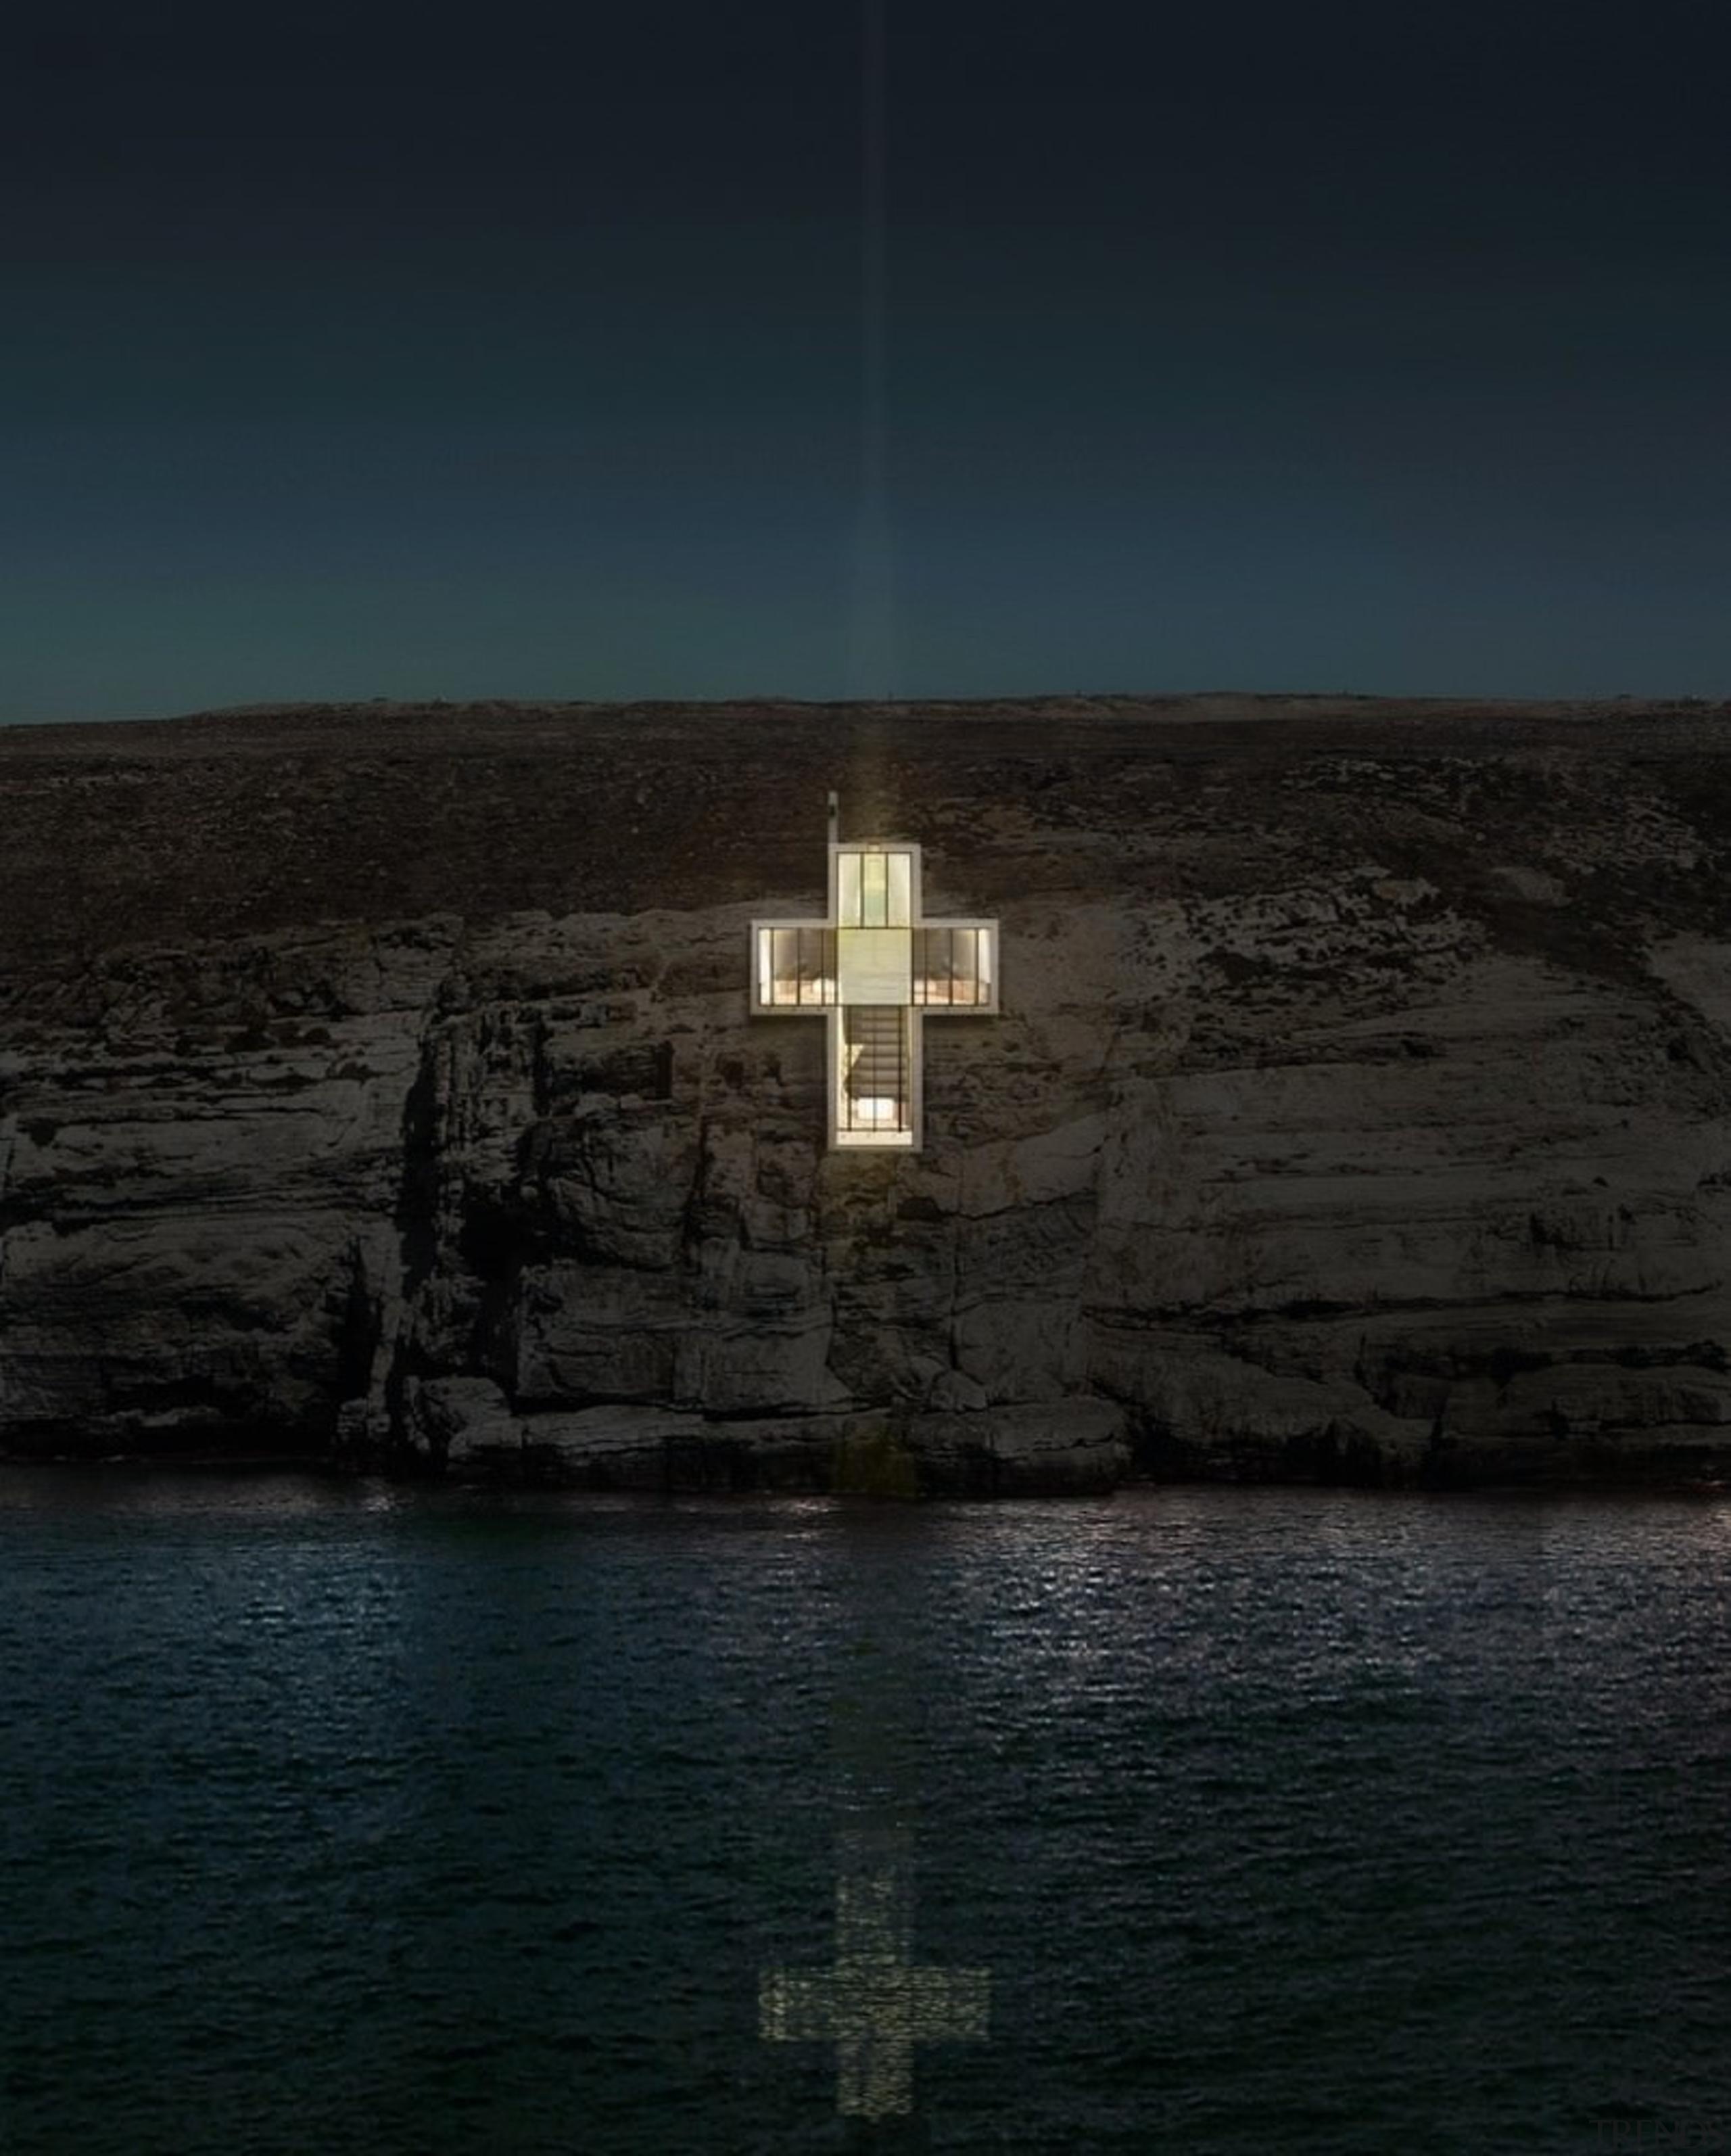 Lux Aeterna / Holy Cross Chapel: Images calm, darkness, horizon, reflection, sea, sky, terrain, water, black